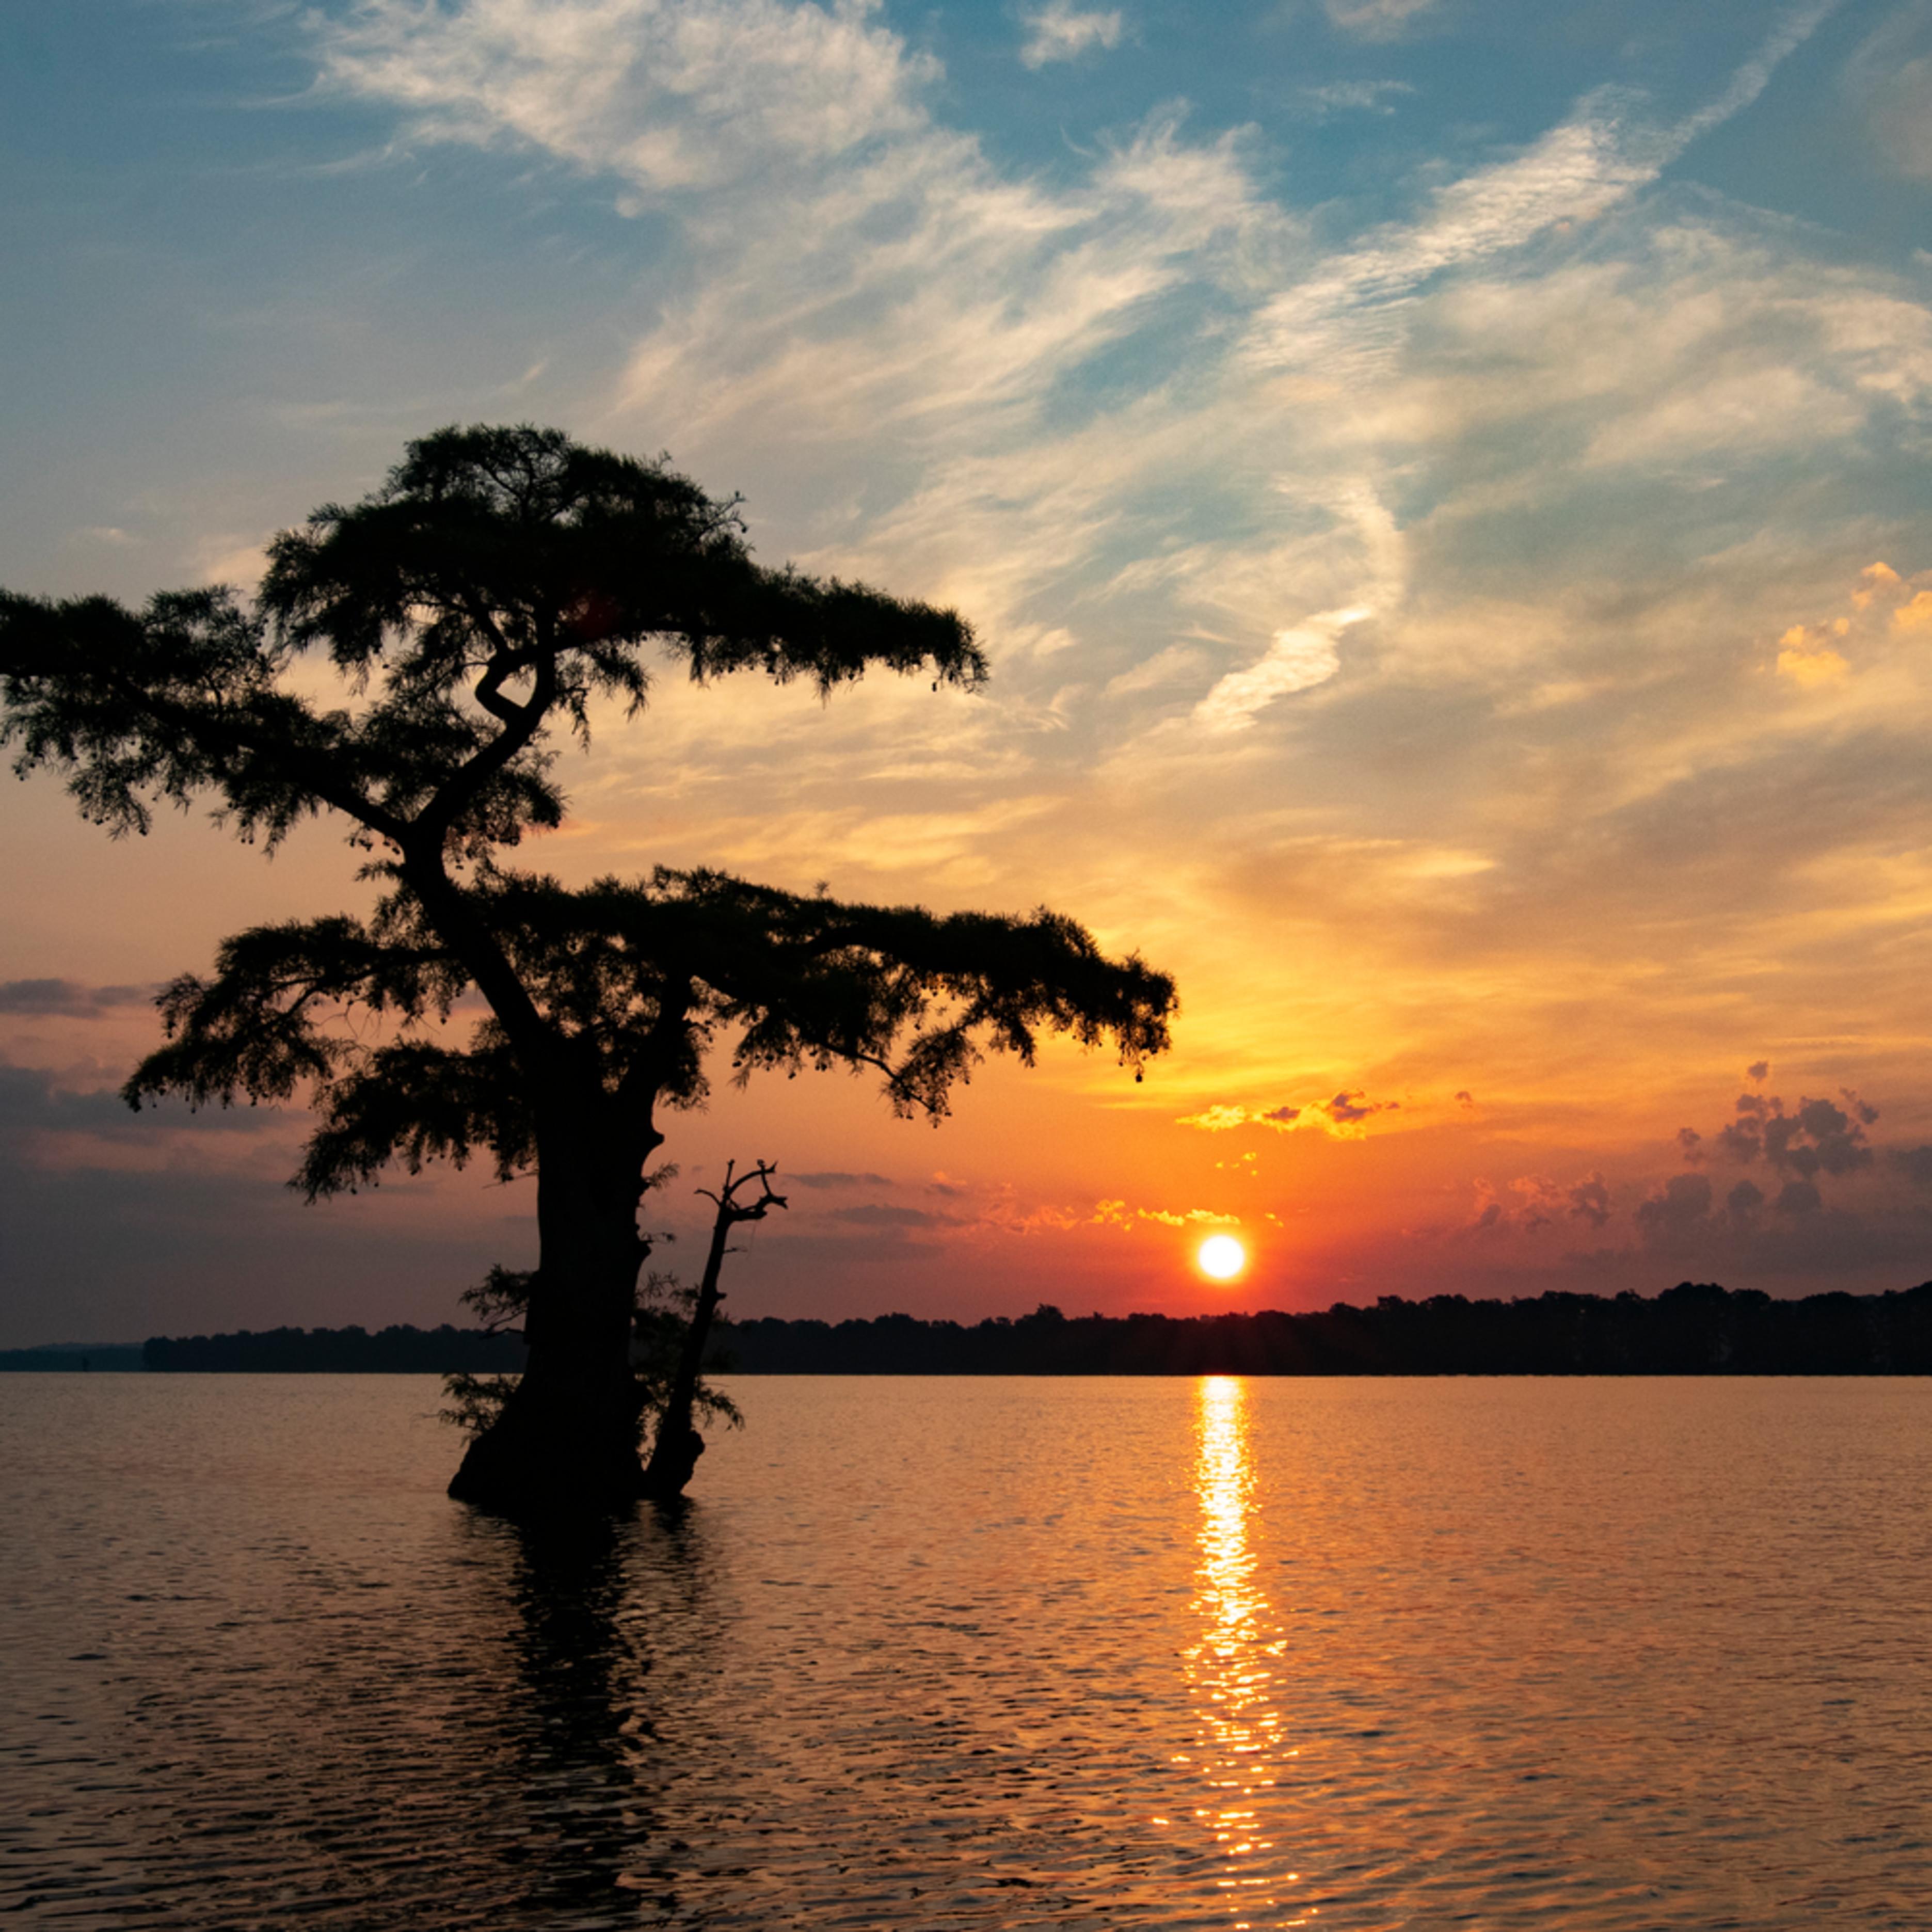 Sunrise lone cypress g  mg 7966 rlt20 xsdvyt